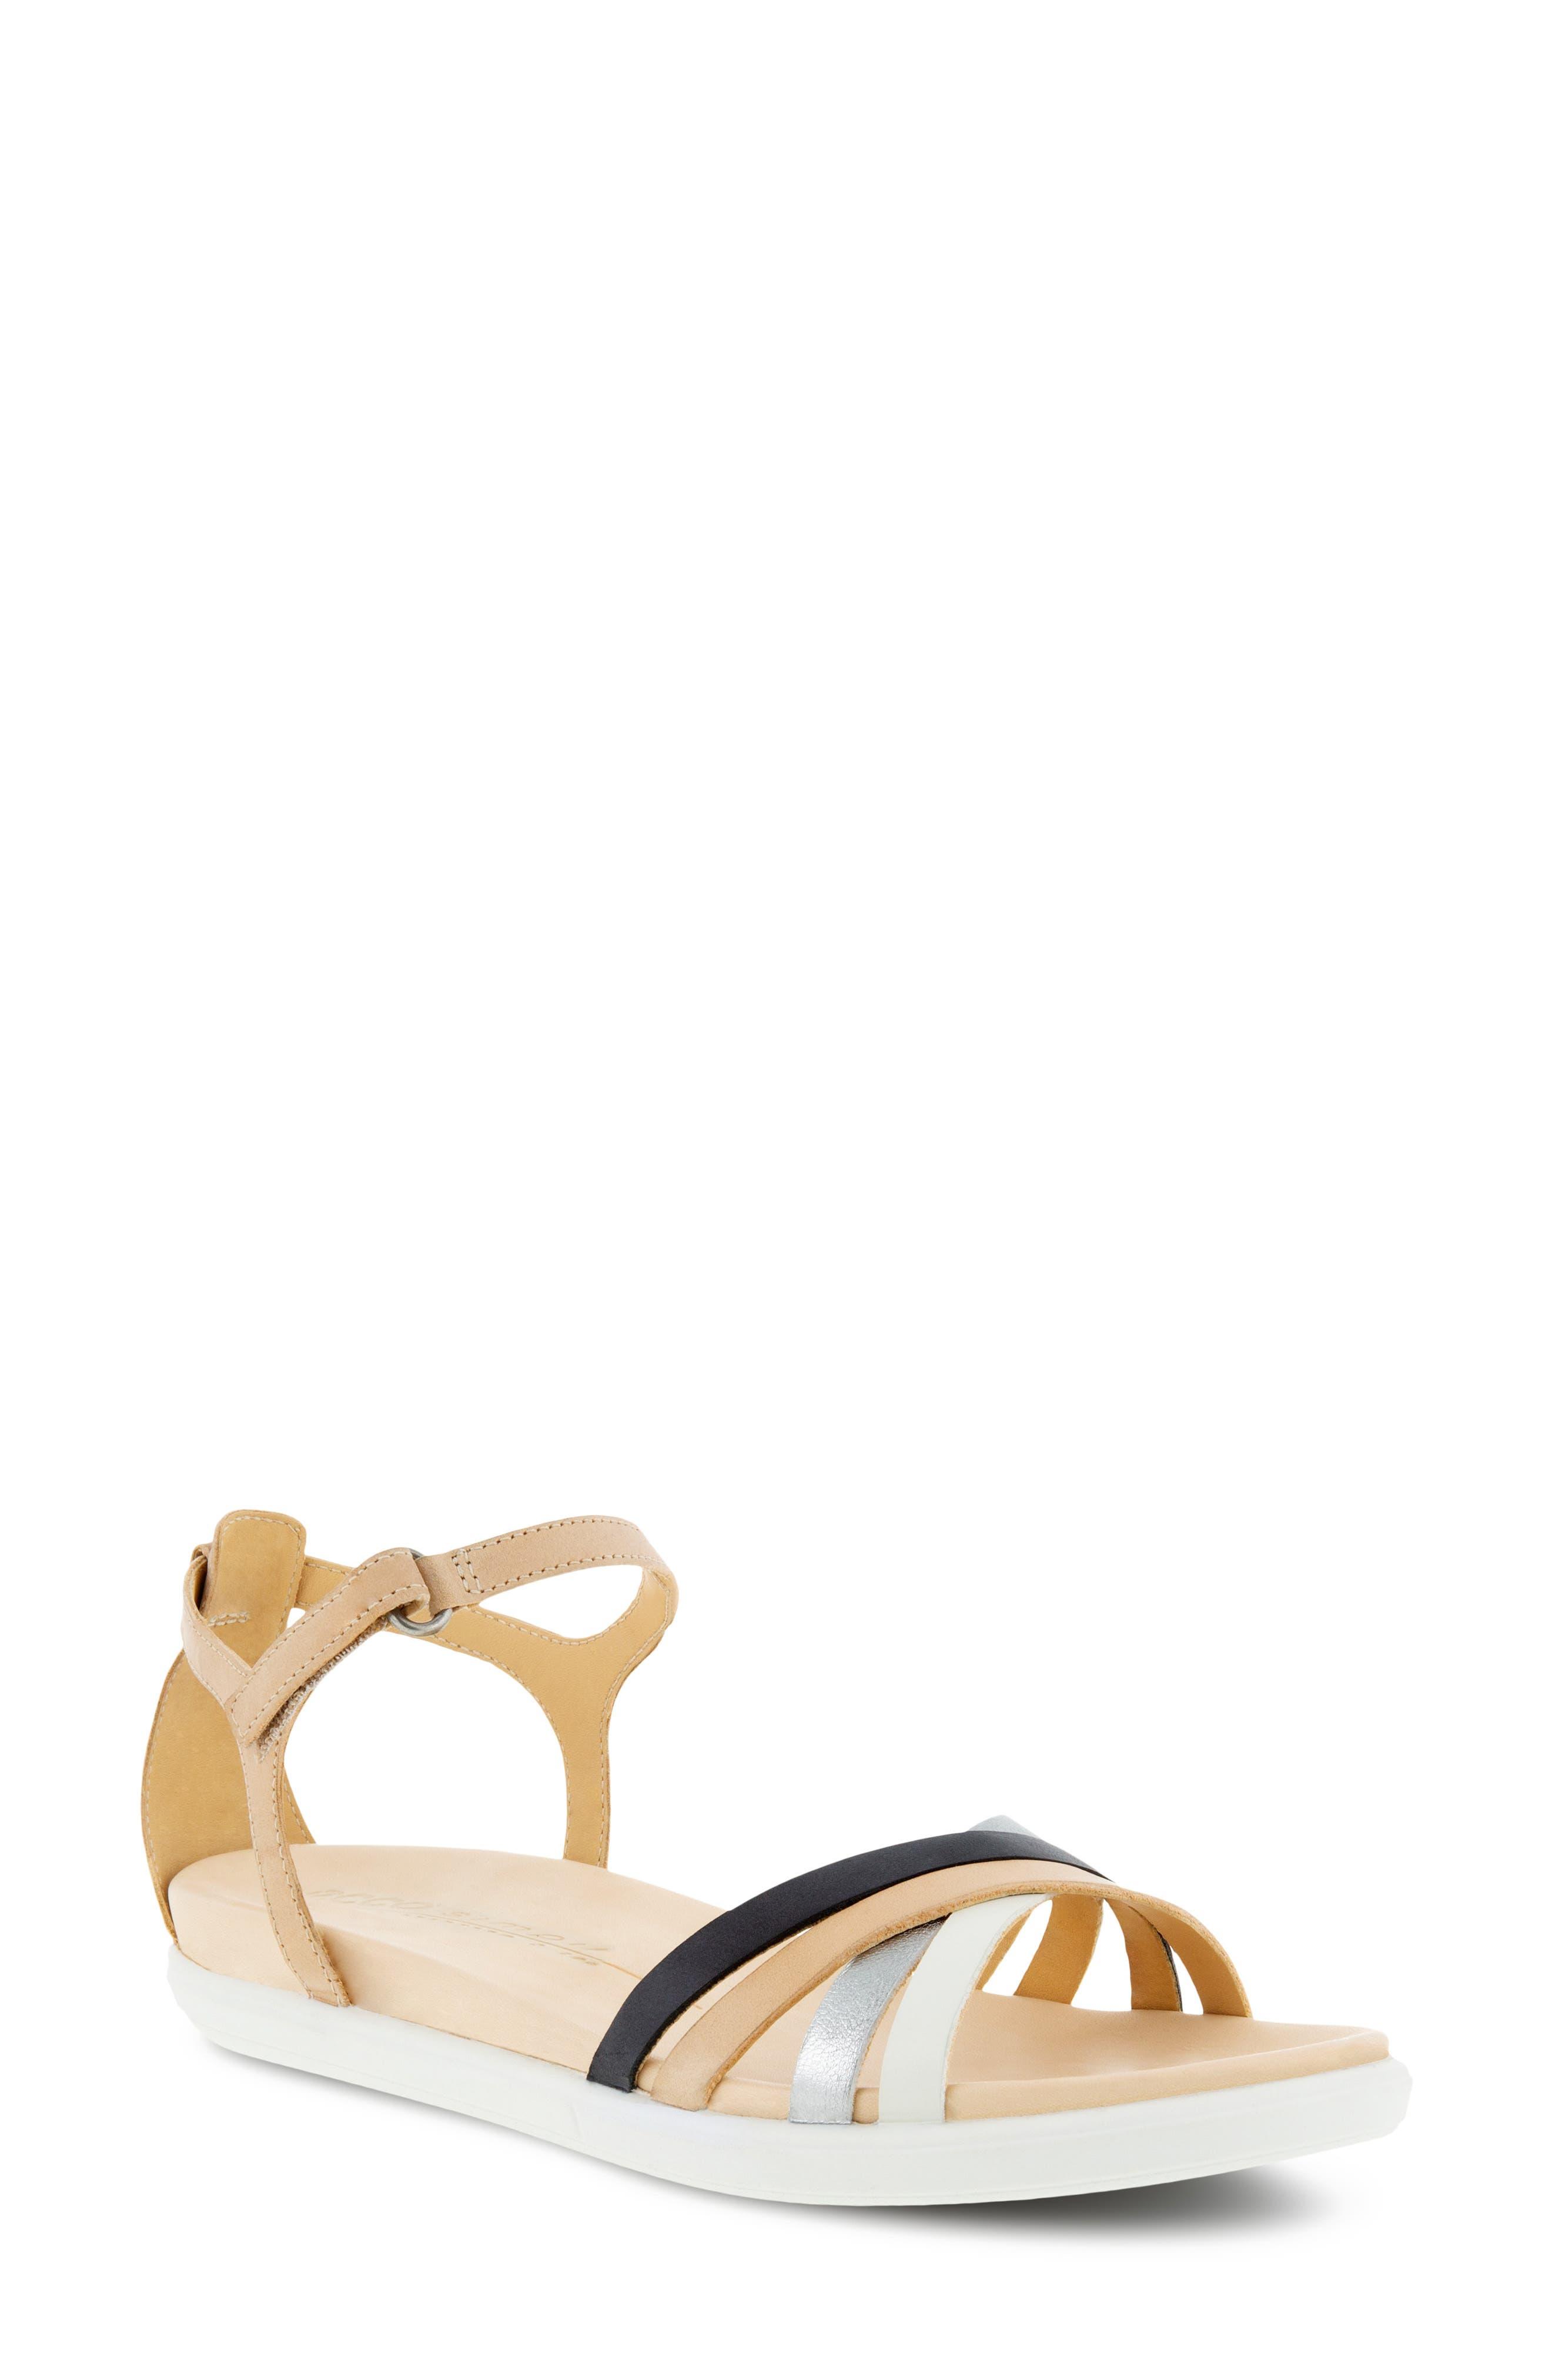 Women's Ecco Simpil Ankle Strap Sandal